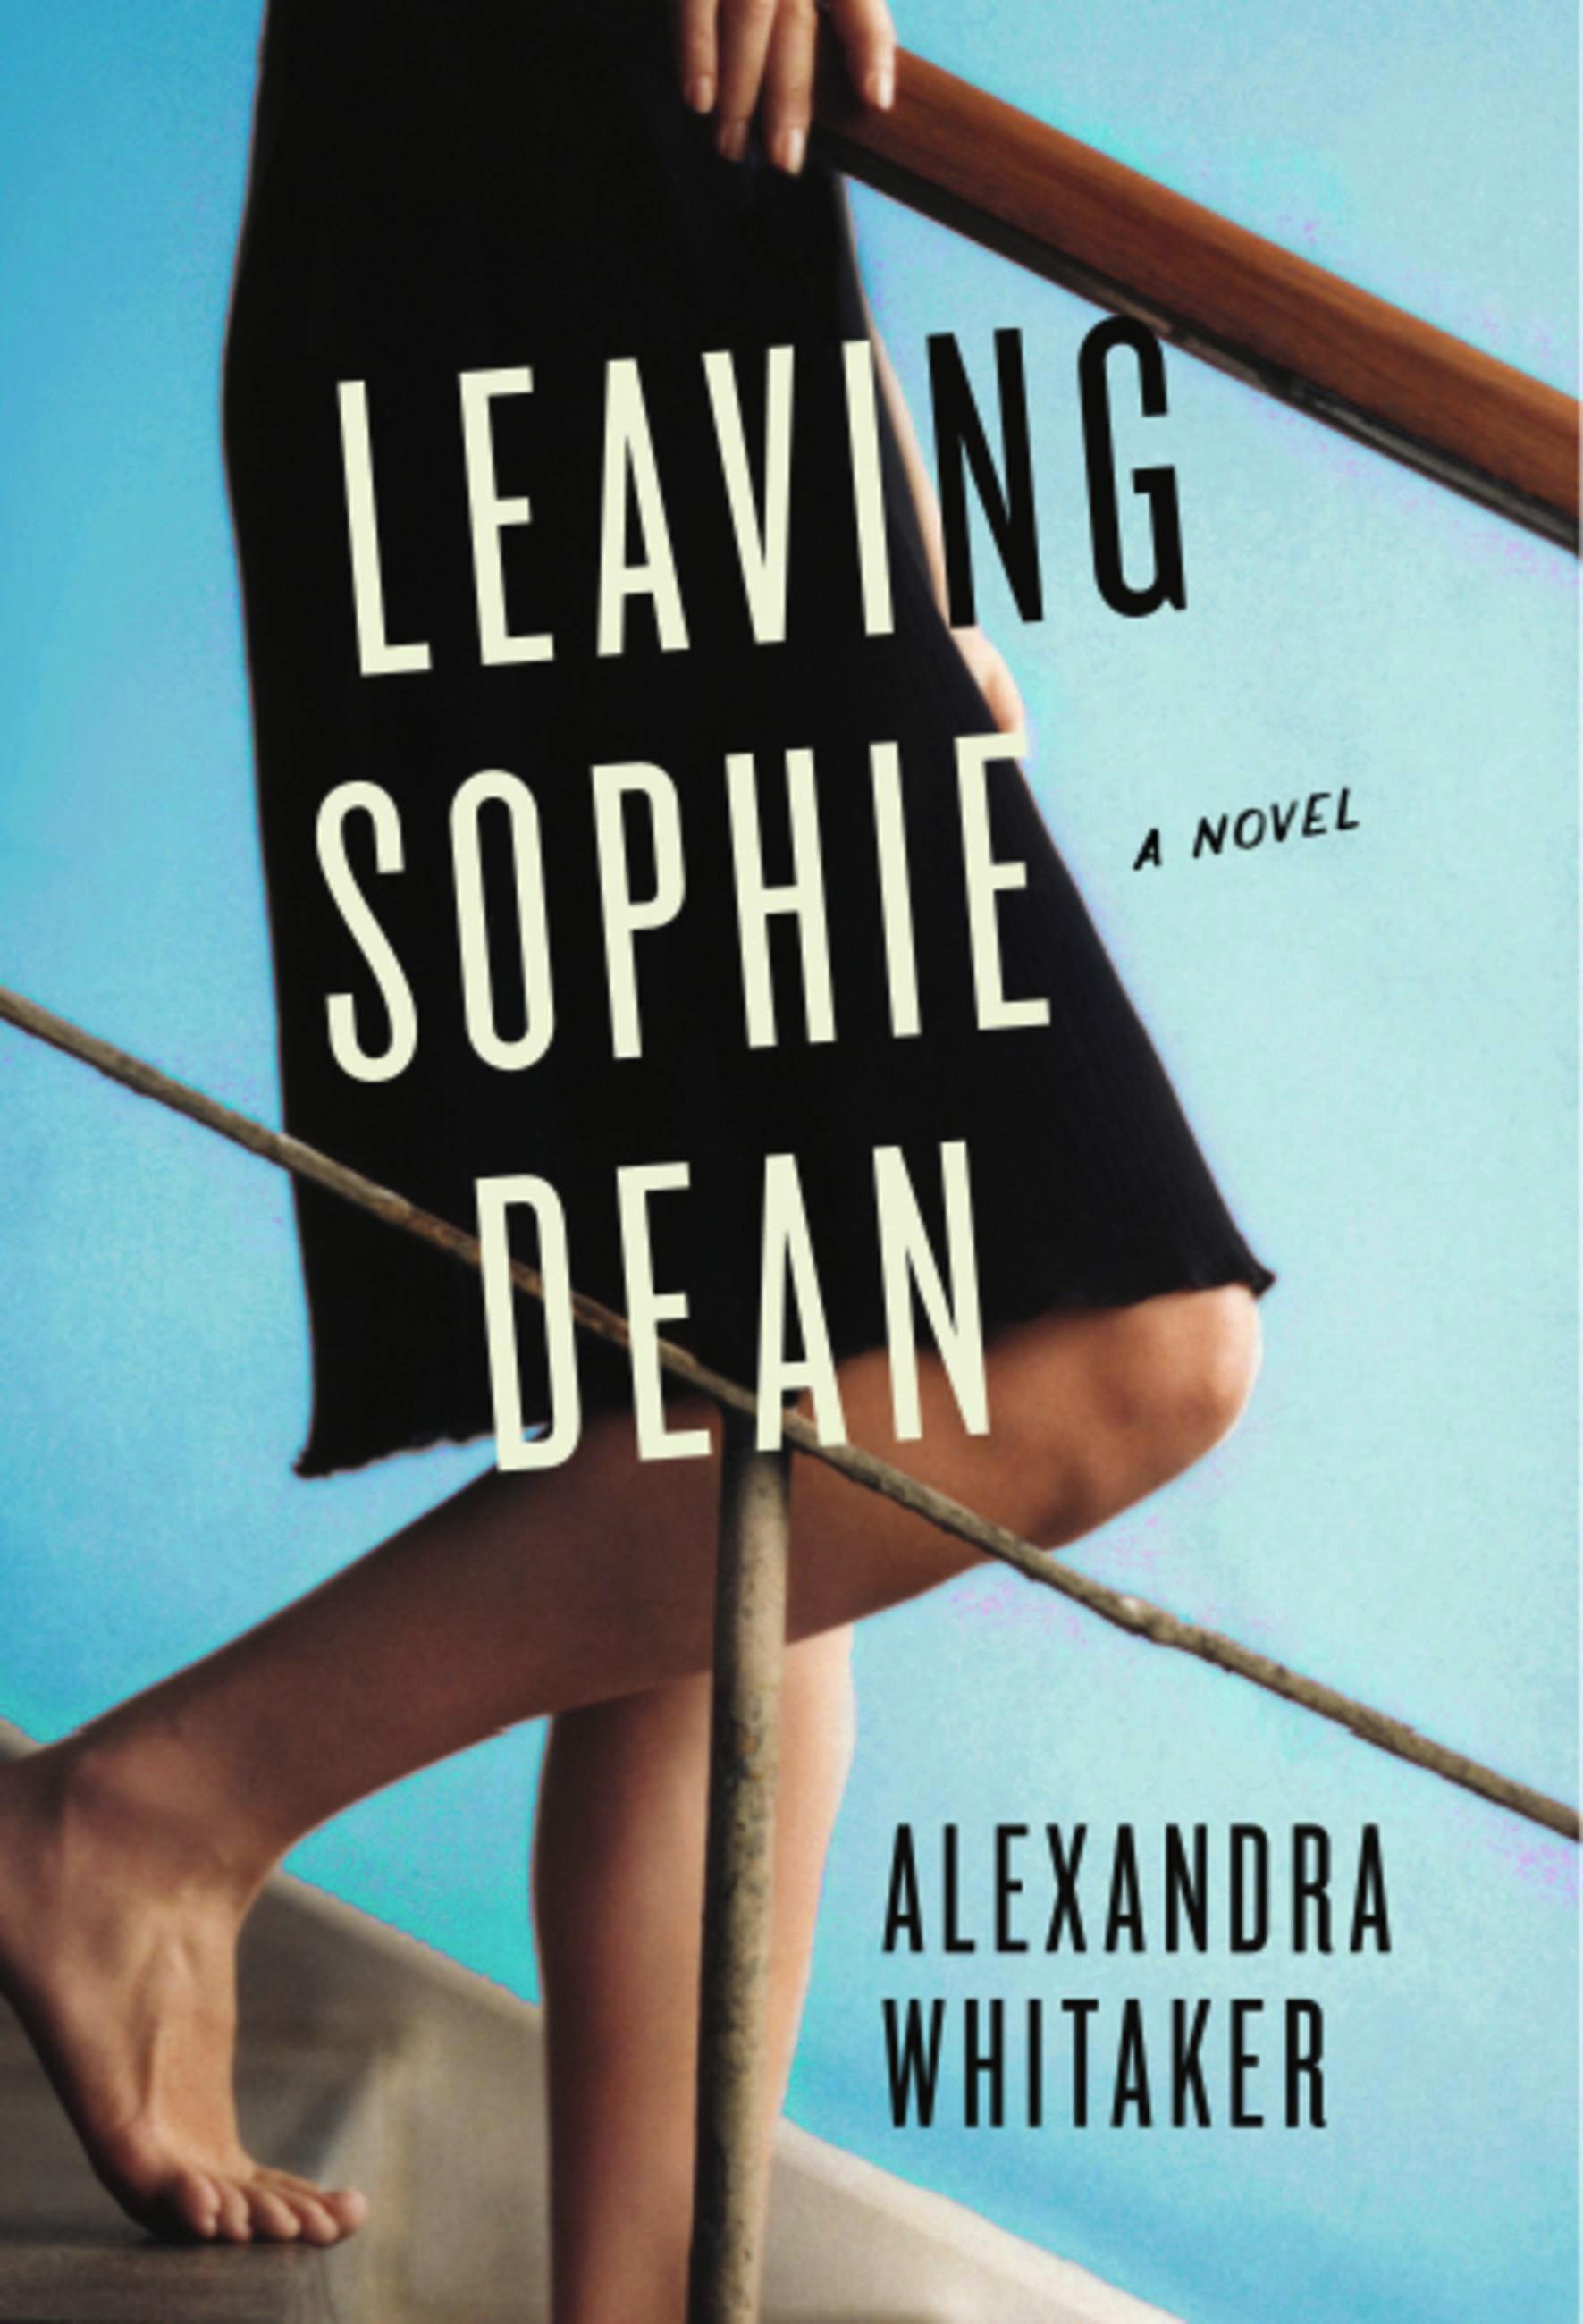 leaving sophie dean whitaker alex andra